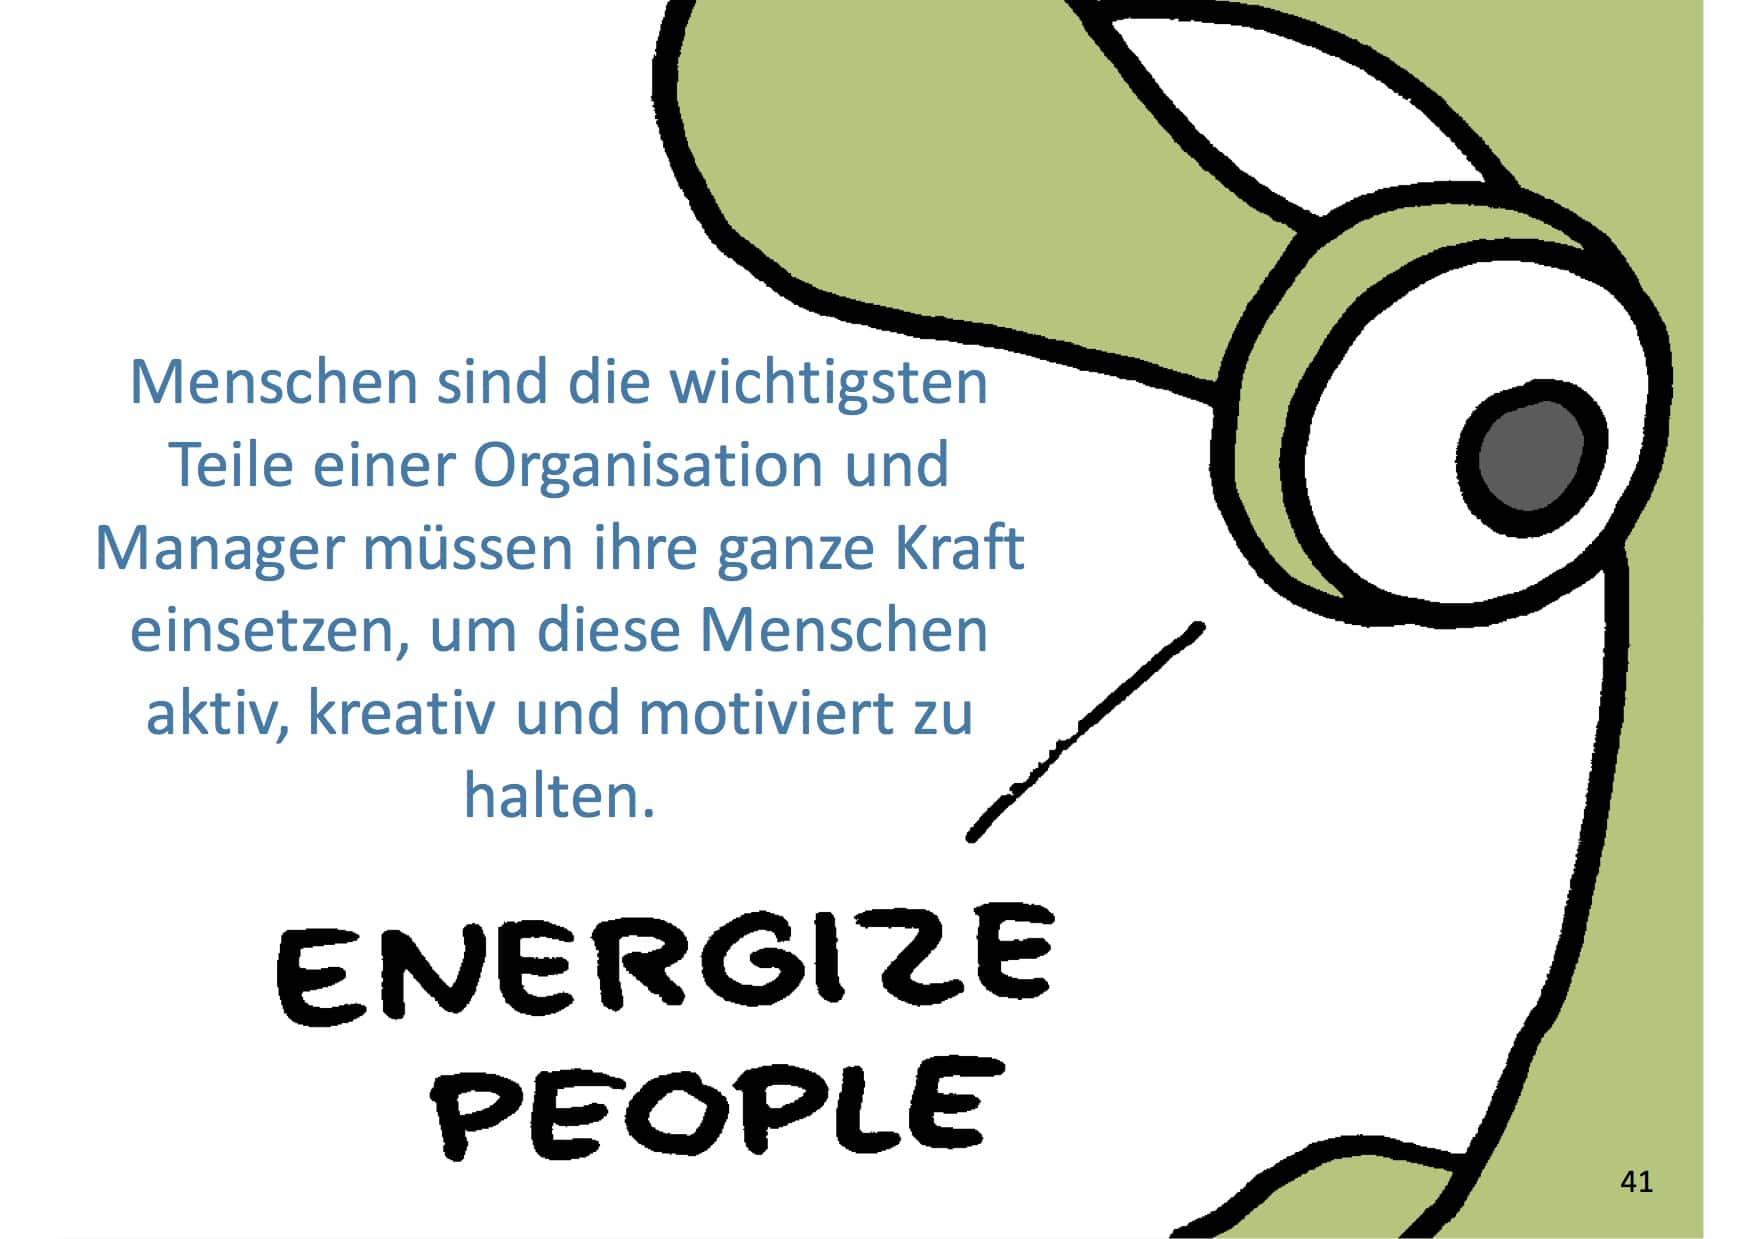 Management 3.0 Energize People